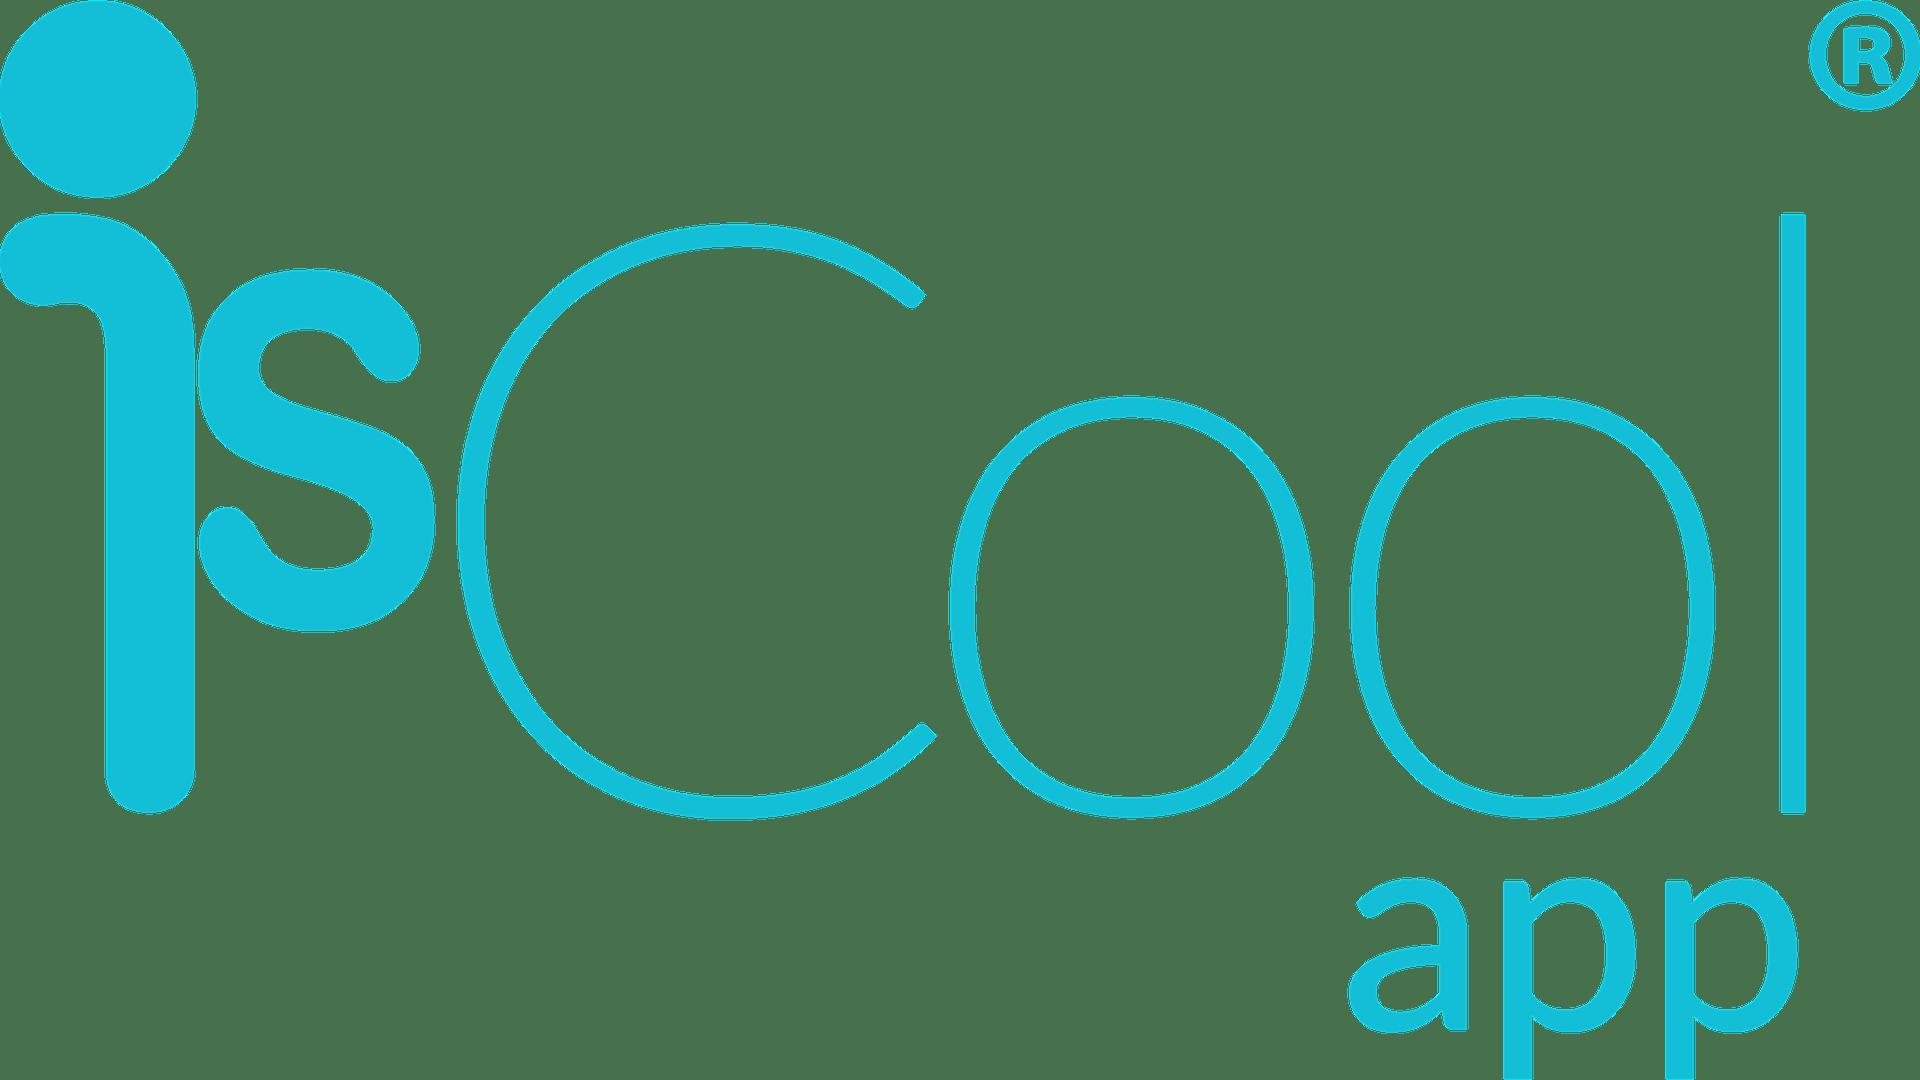 IsCool App